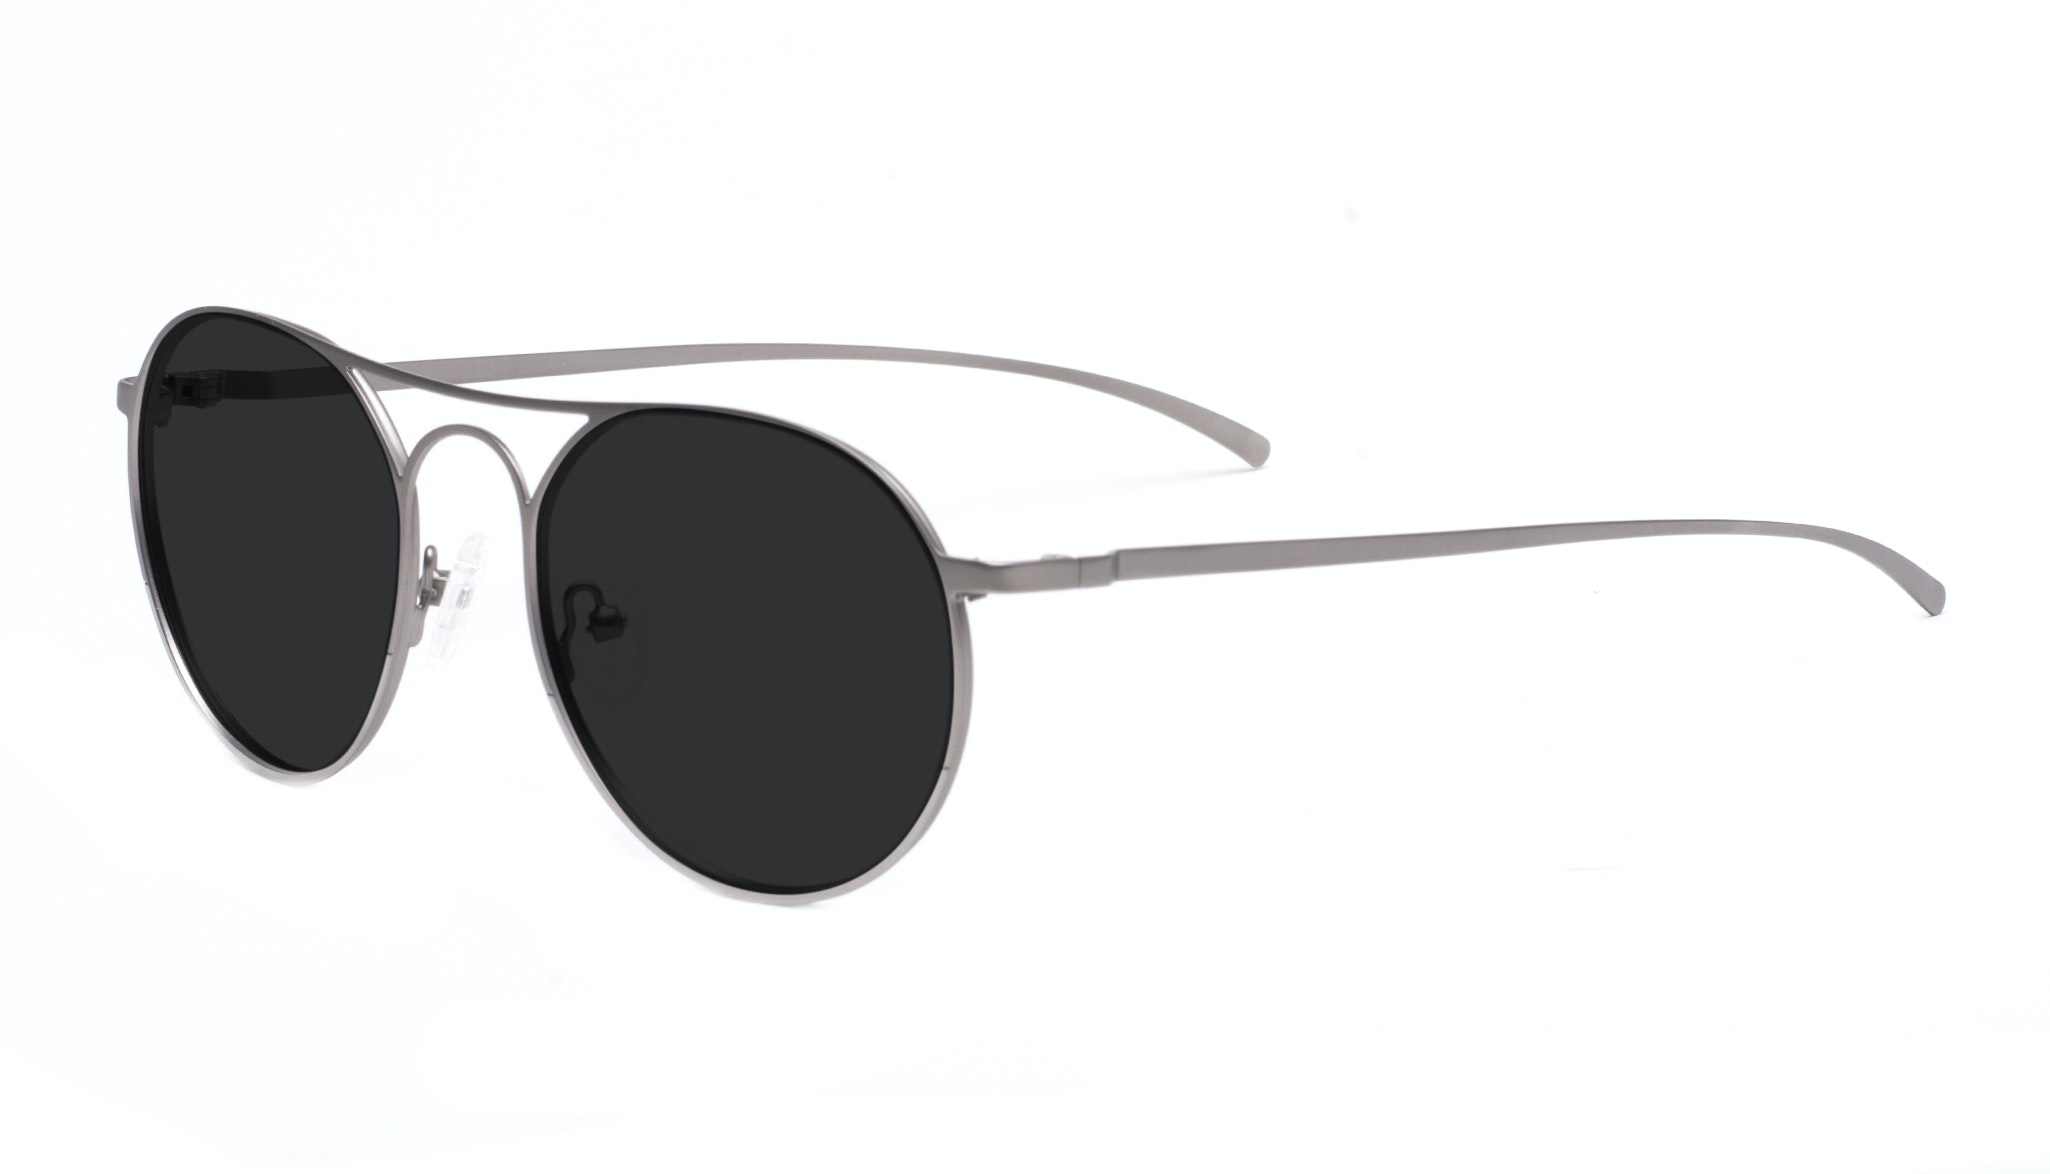 Affordable Fashion Glasses Aviator Round Sunglasses Men Contour Silver Tilt